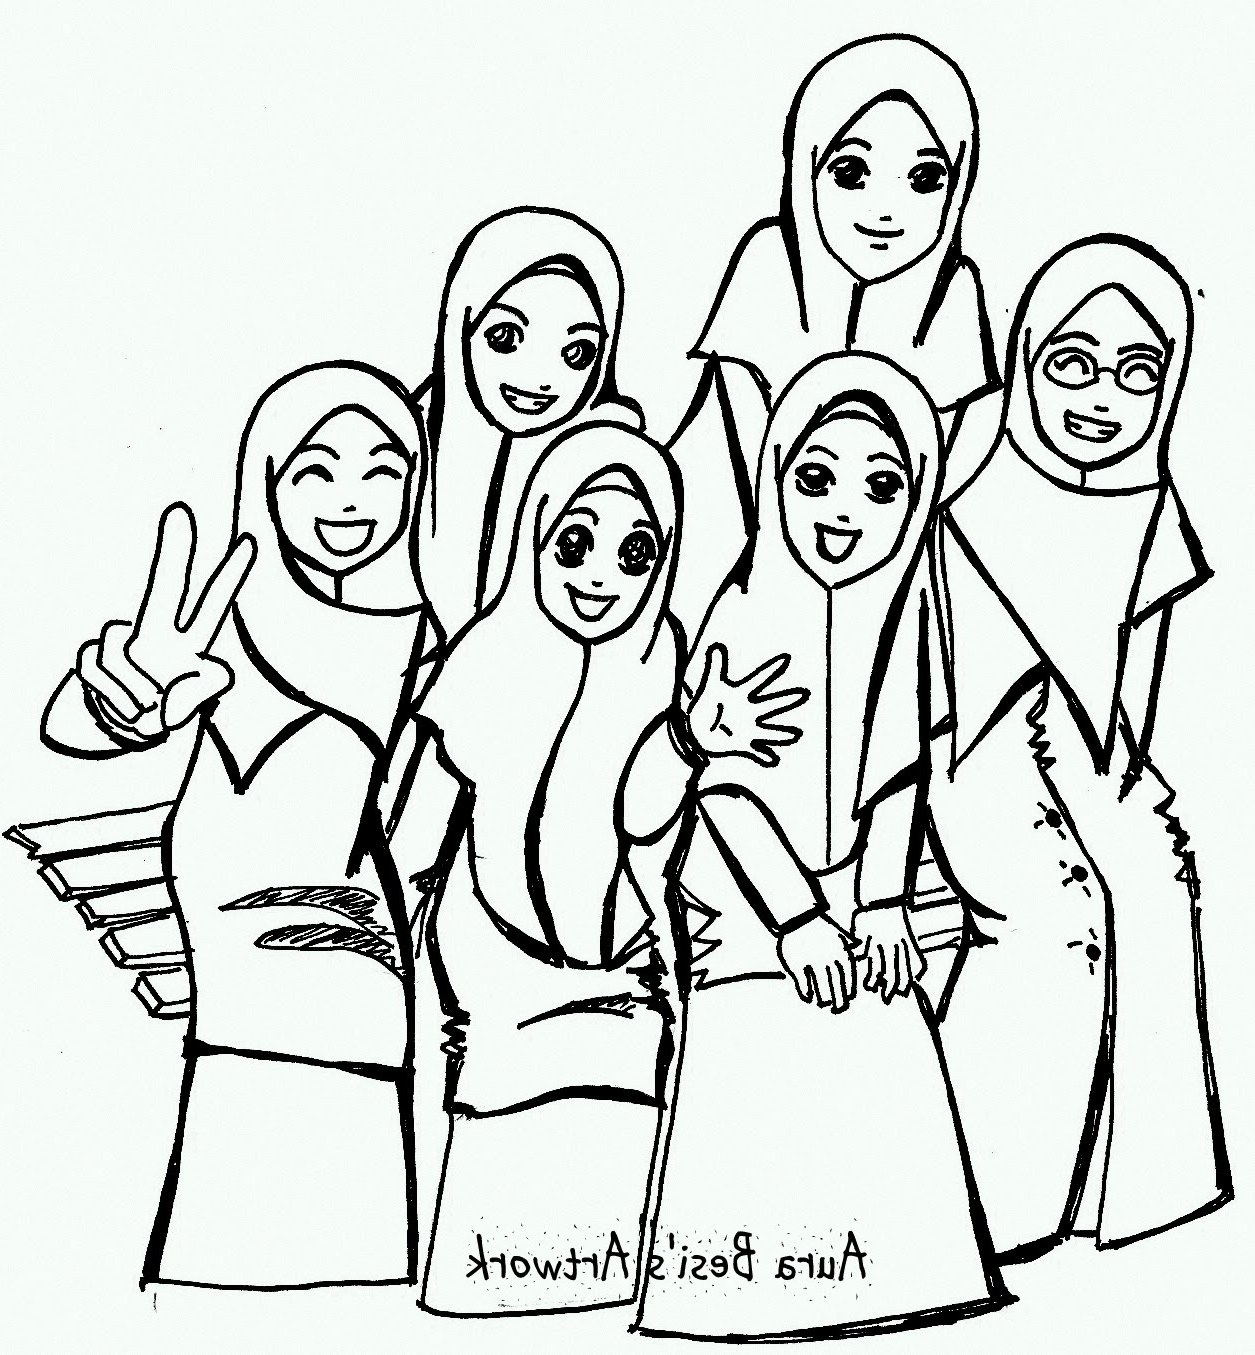 Ide Muslimah Kartun Sahabat Ipdd top Gambar Kartun Muslimah Bersahabat